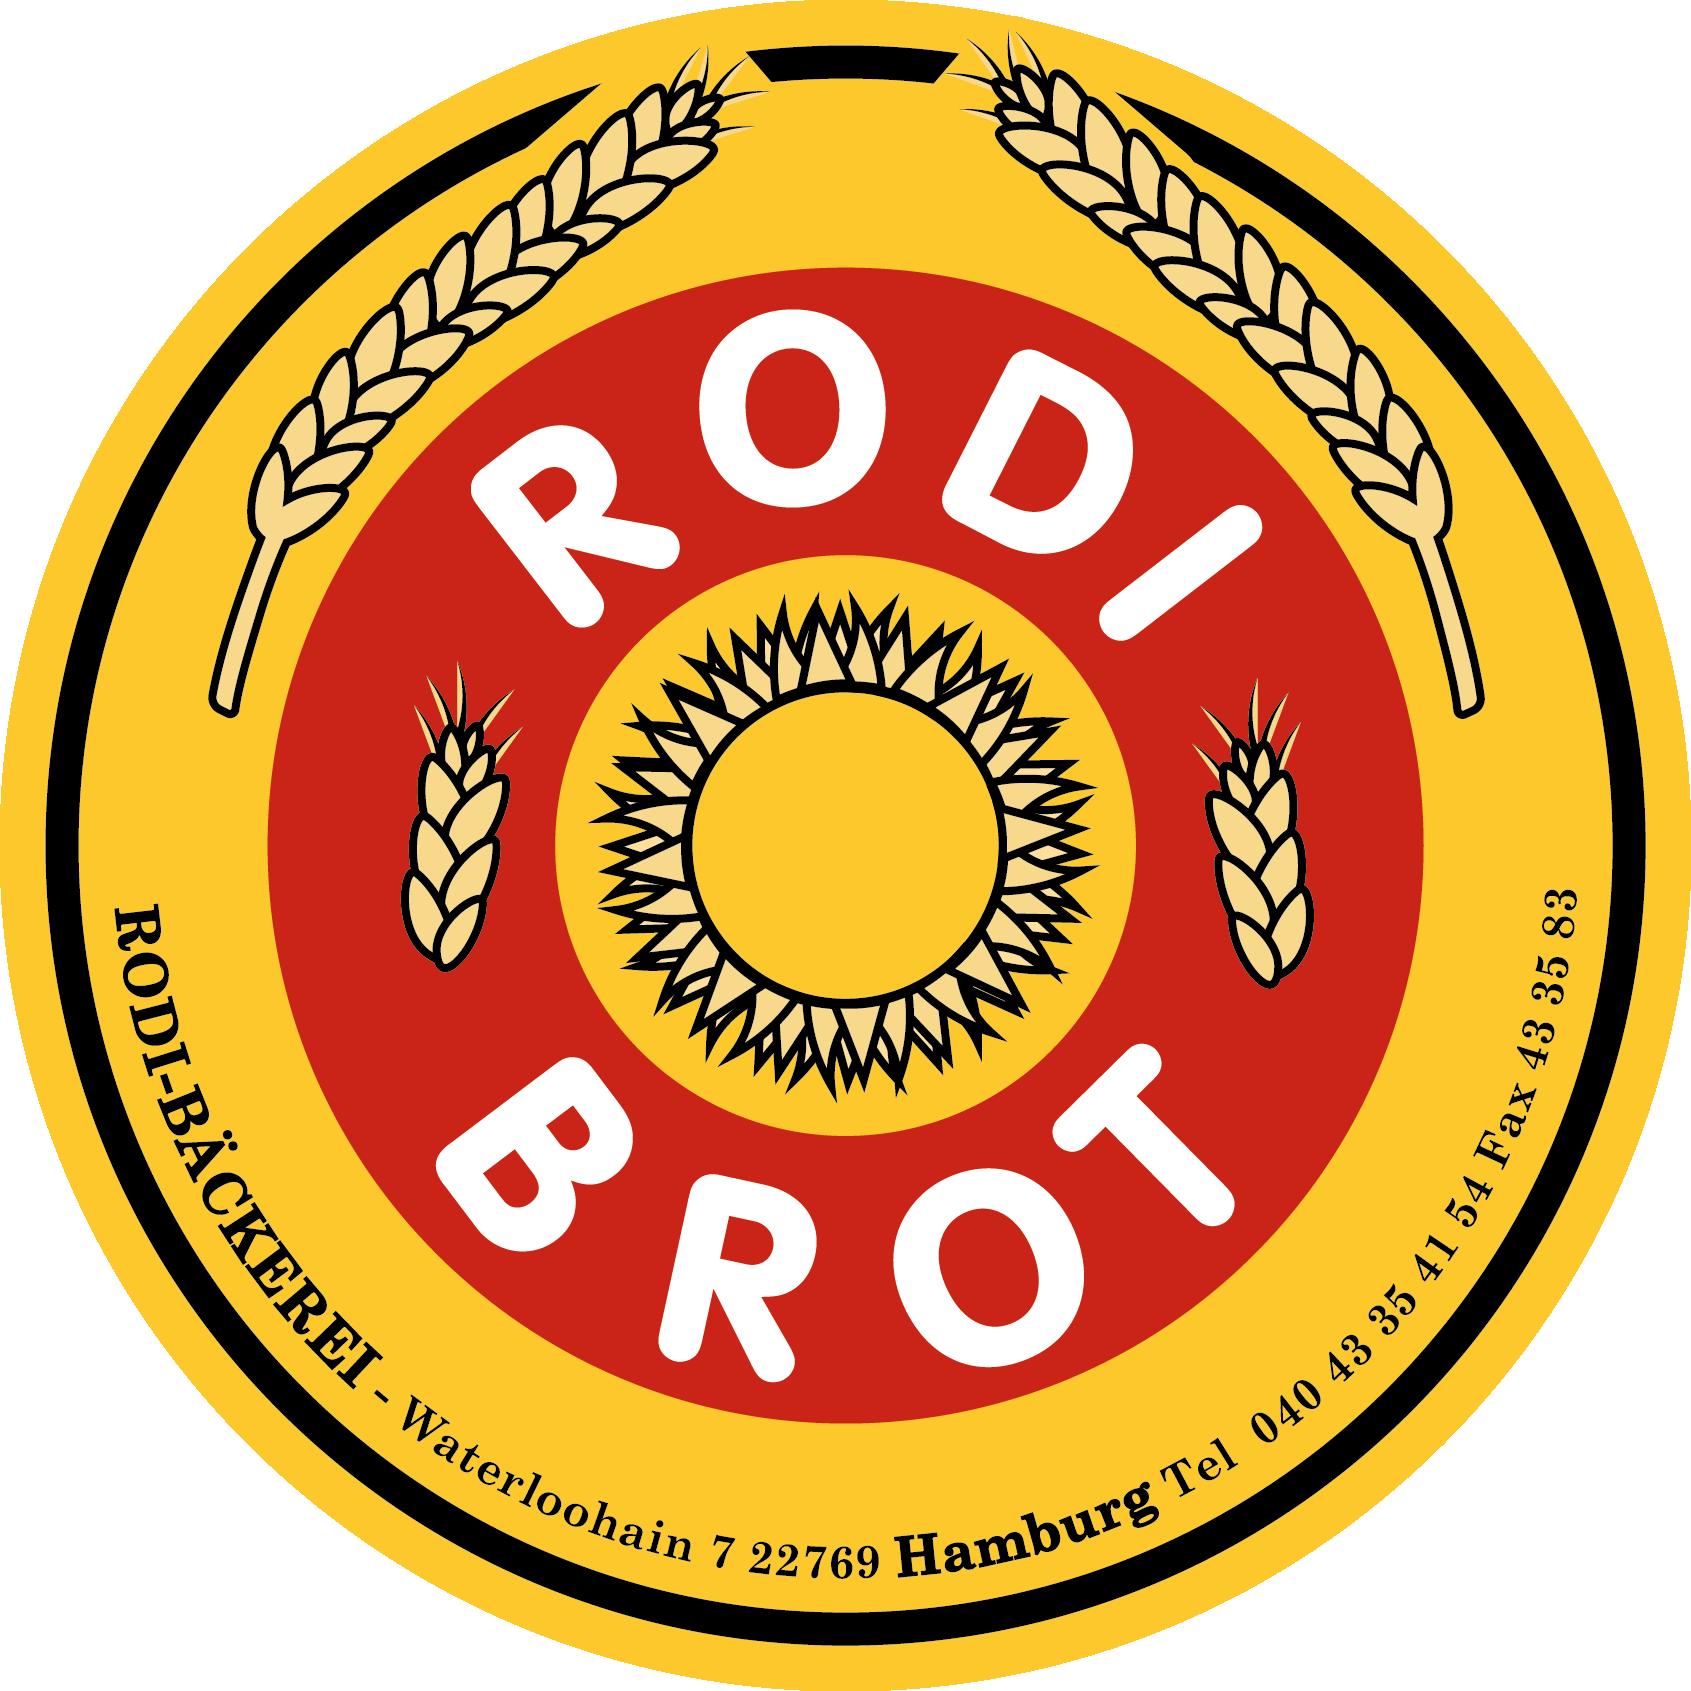 Rodi Brot - Bäckerei in Hamburg